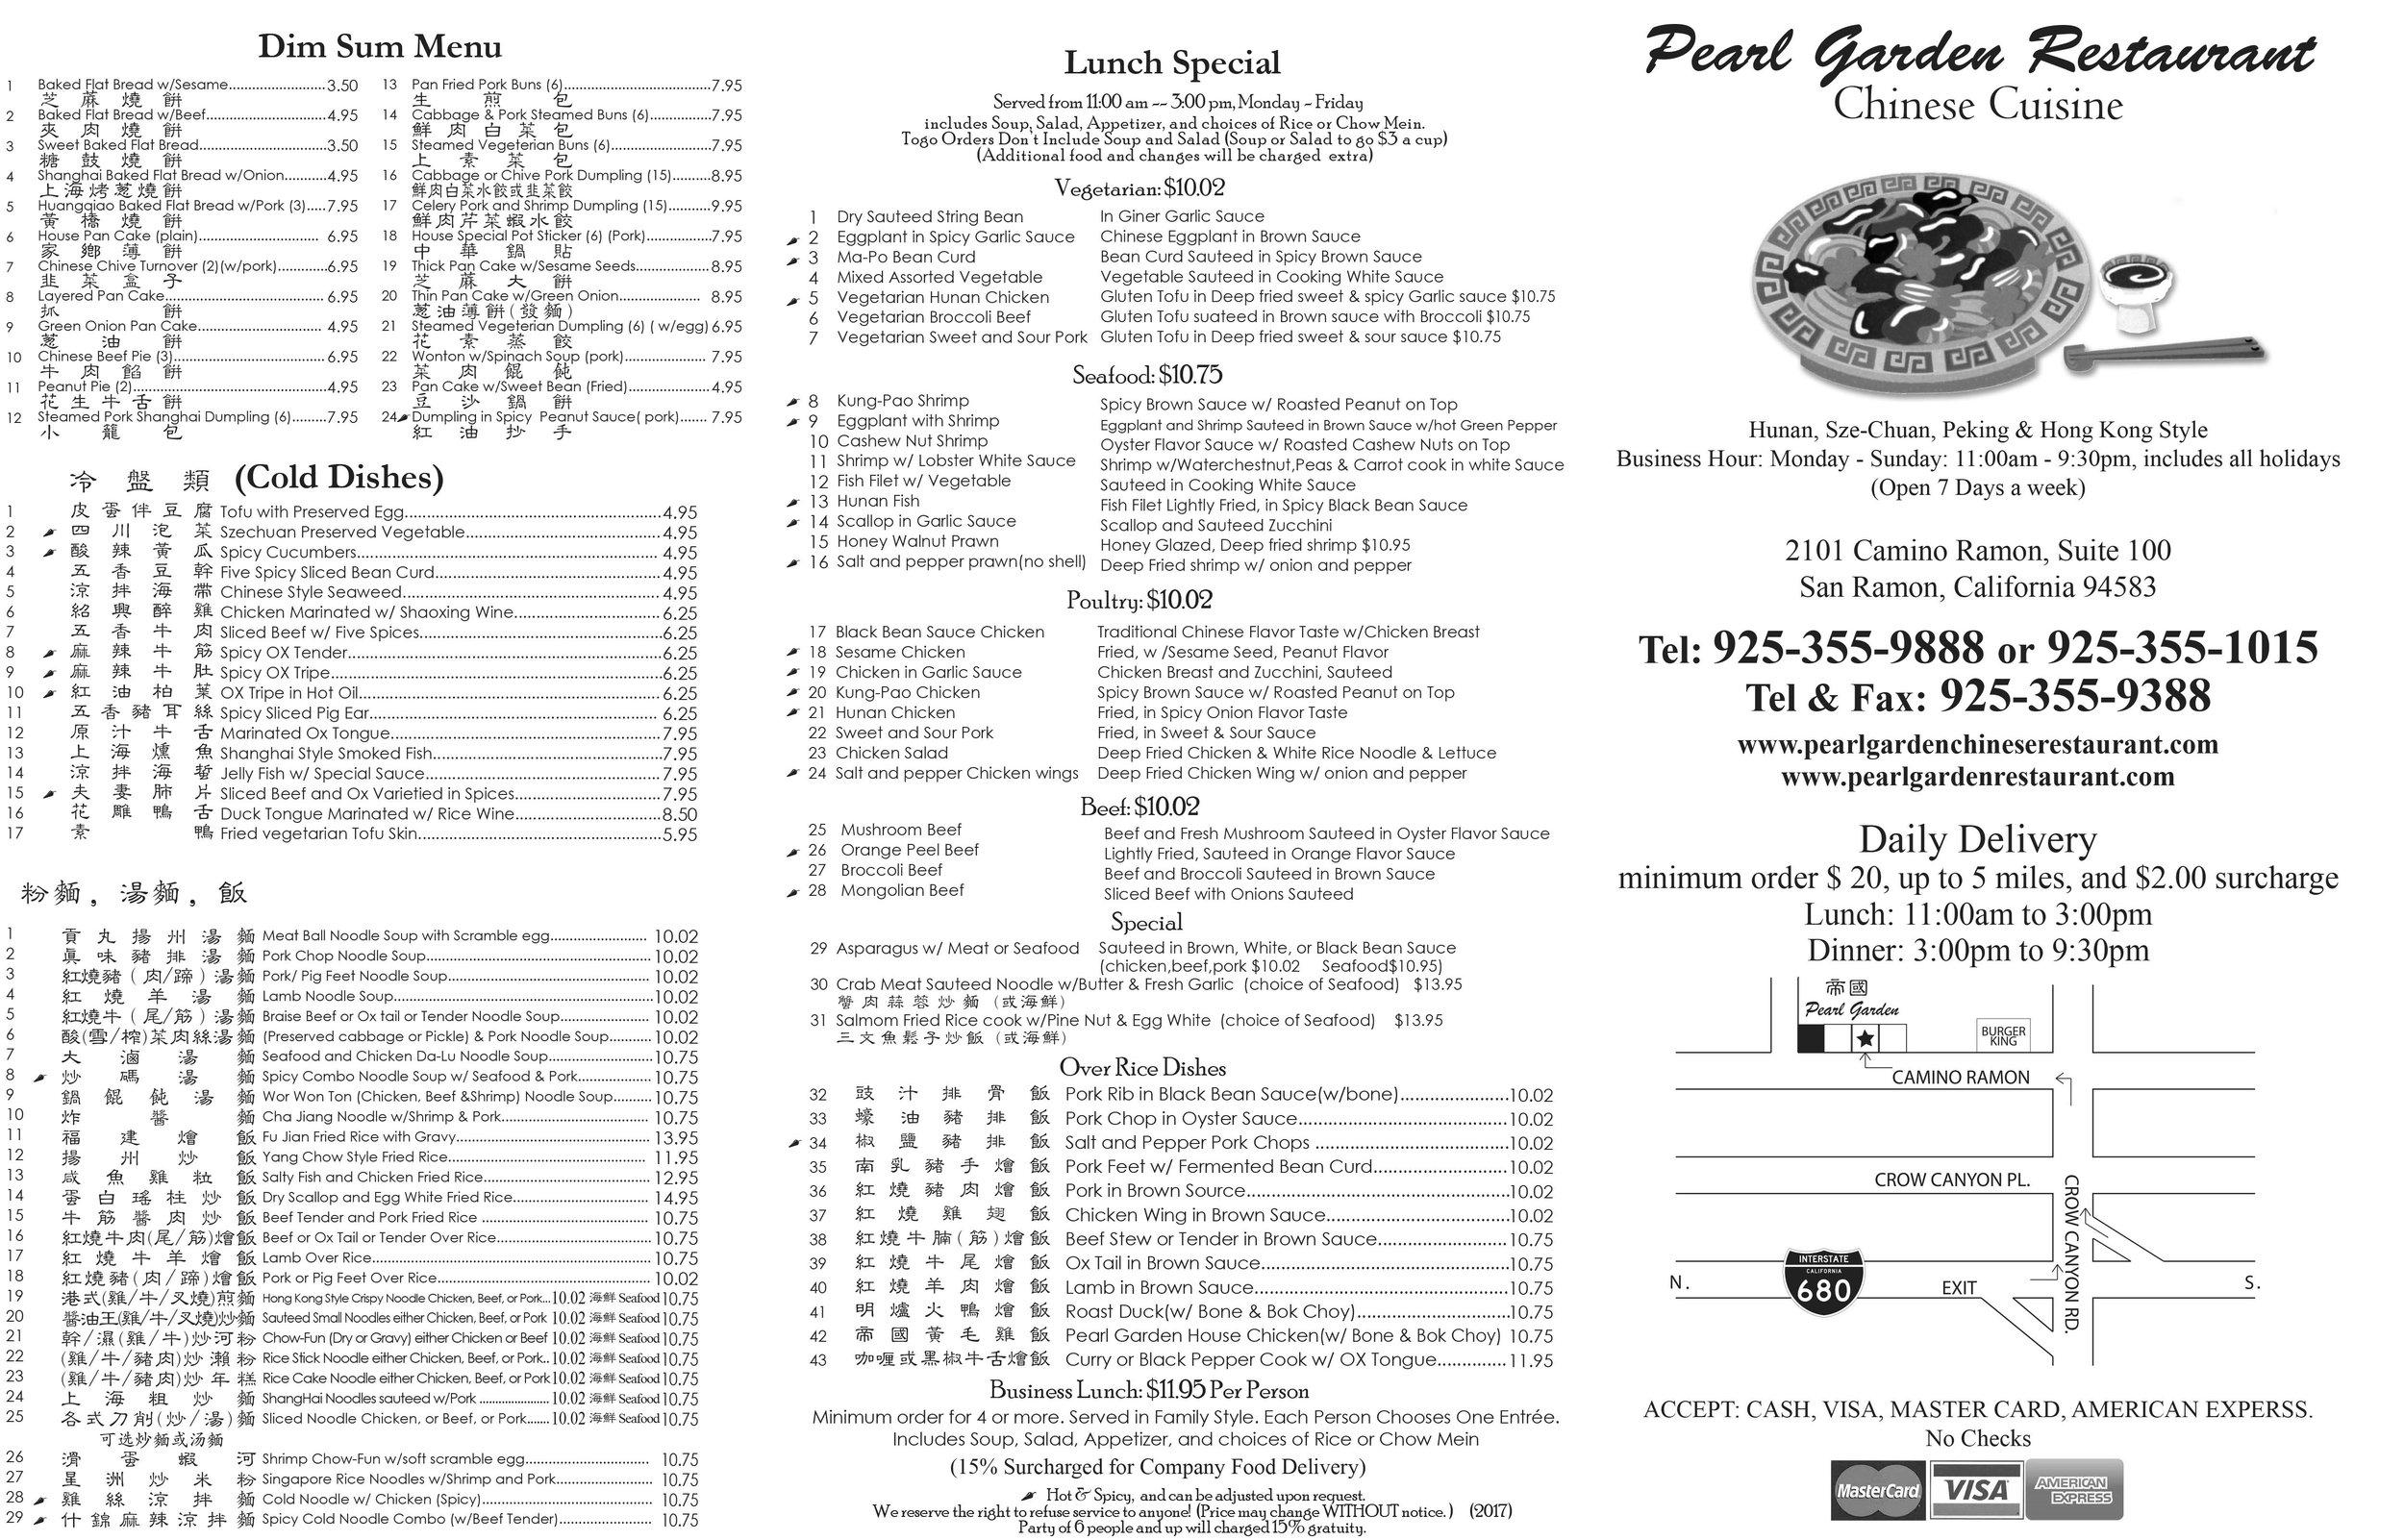 togo menu Englsih-1.jpg